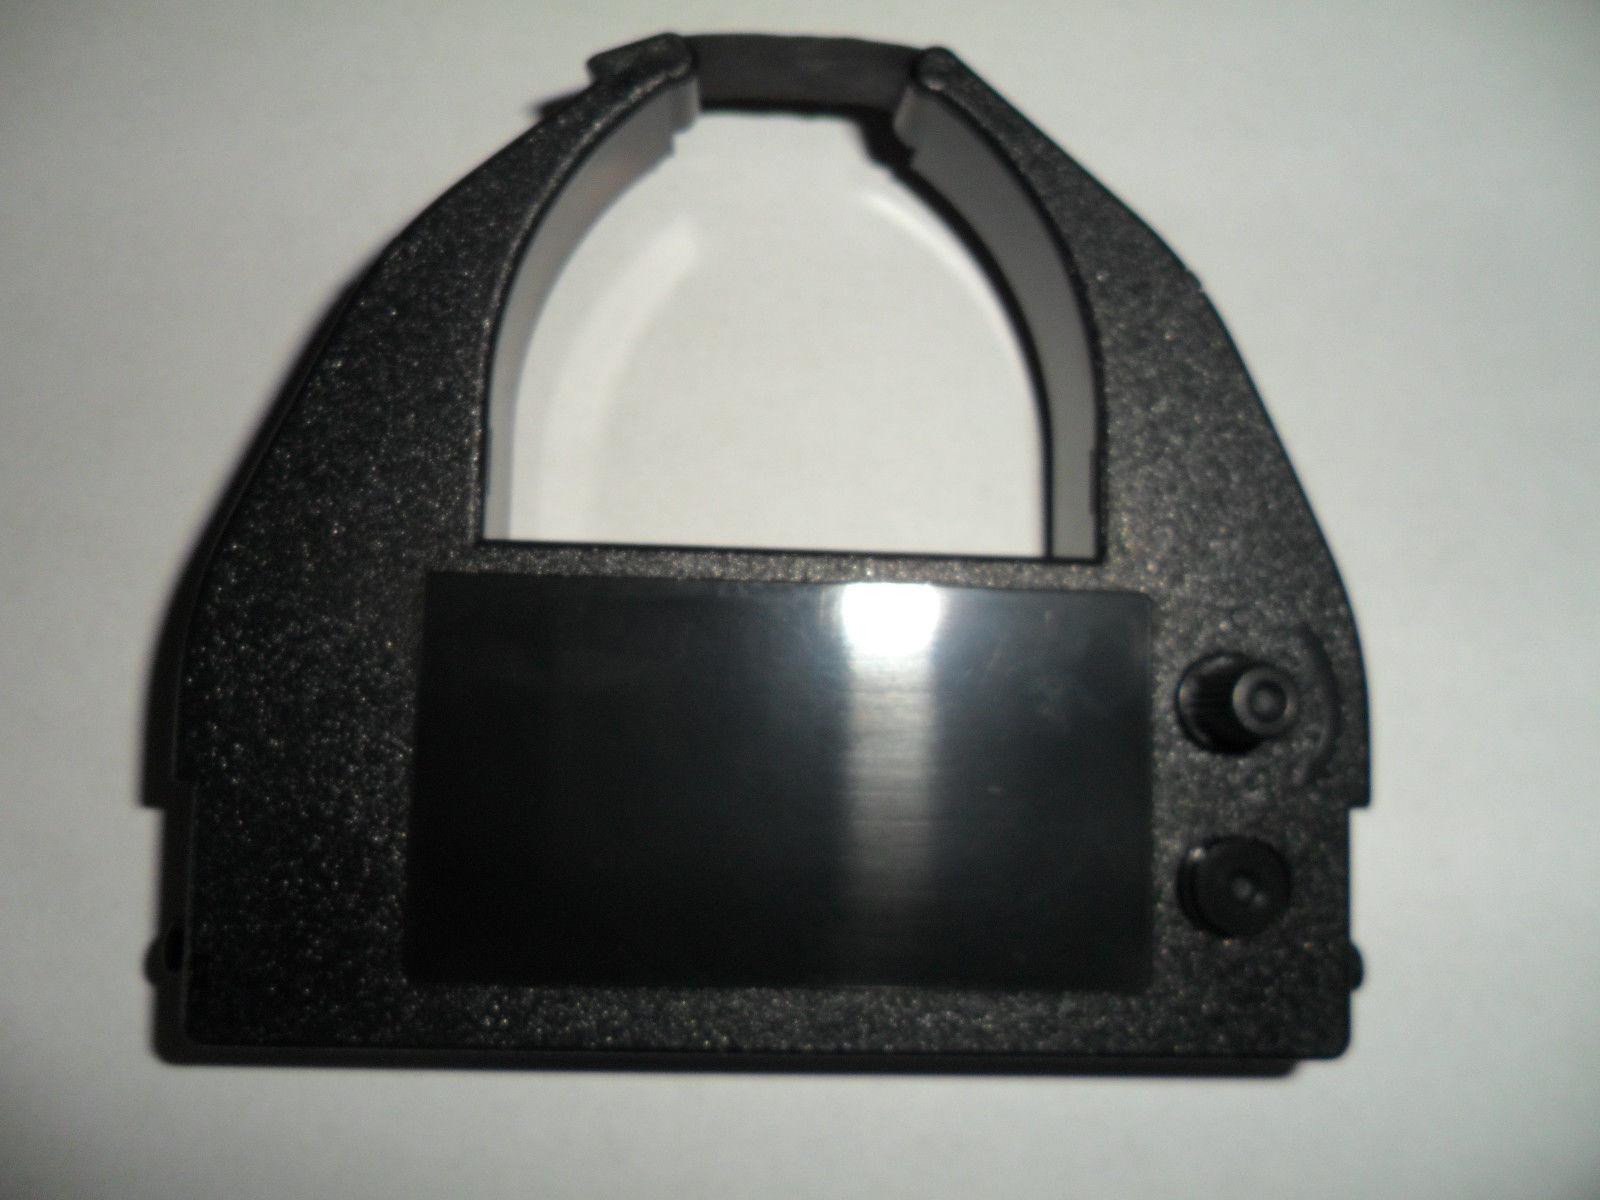 Amano MJR7000/MJR7000 EZ Time Clock Ribbon Black (2 Pack) Replaces C-872304